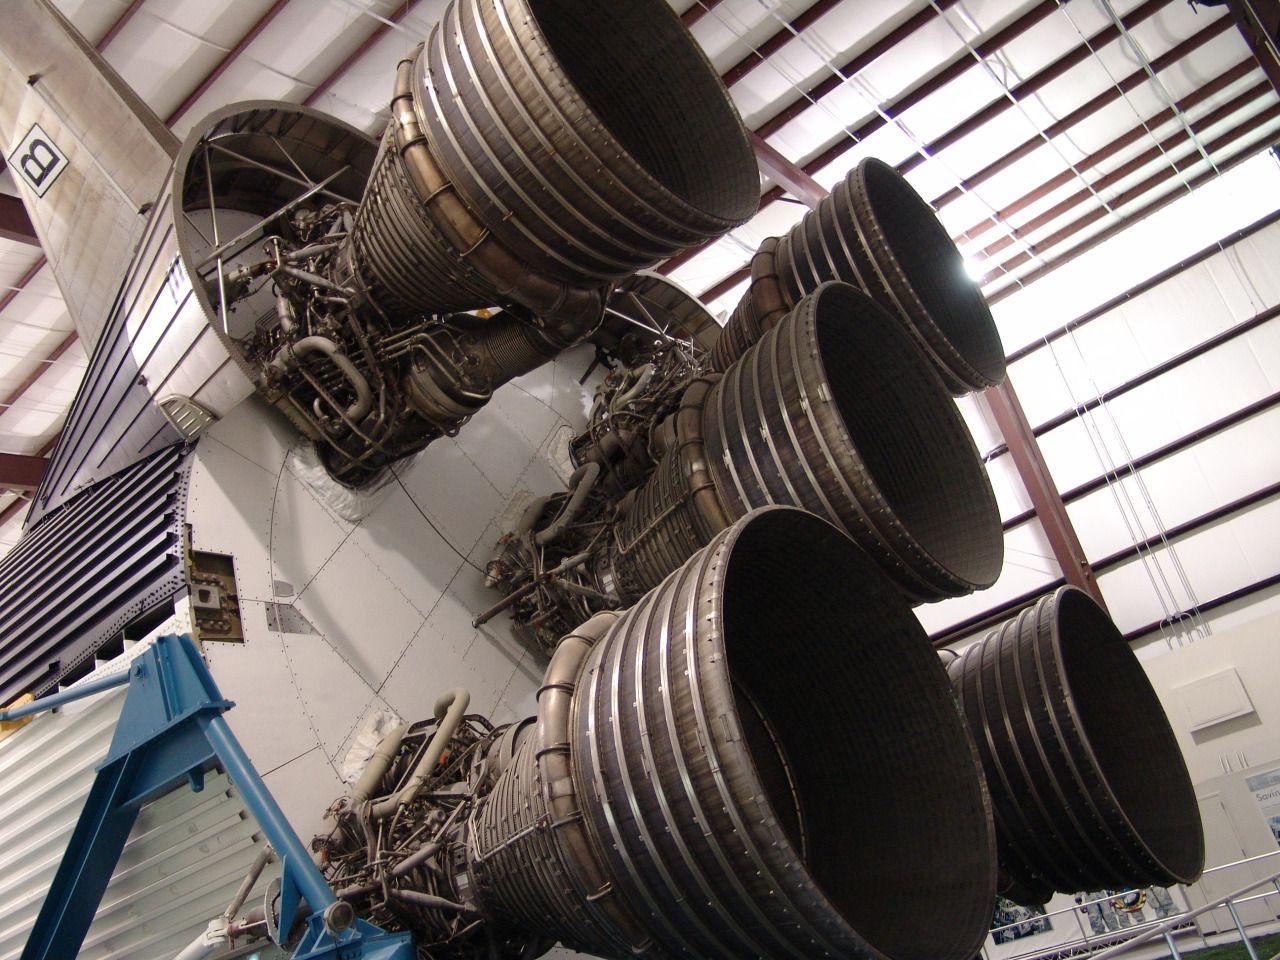 Rocketumblr